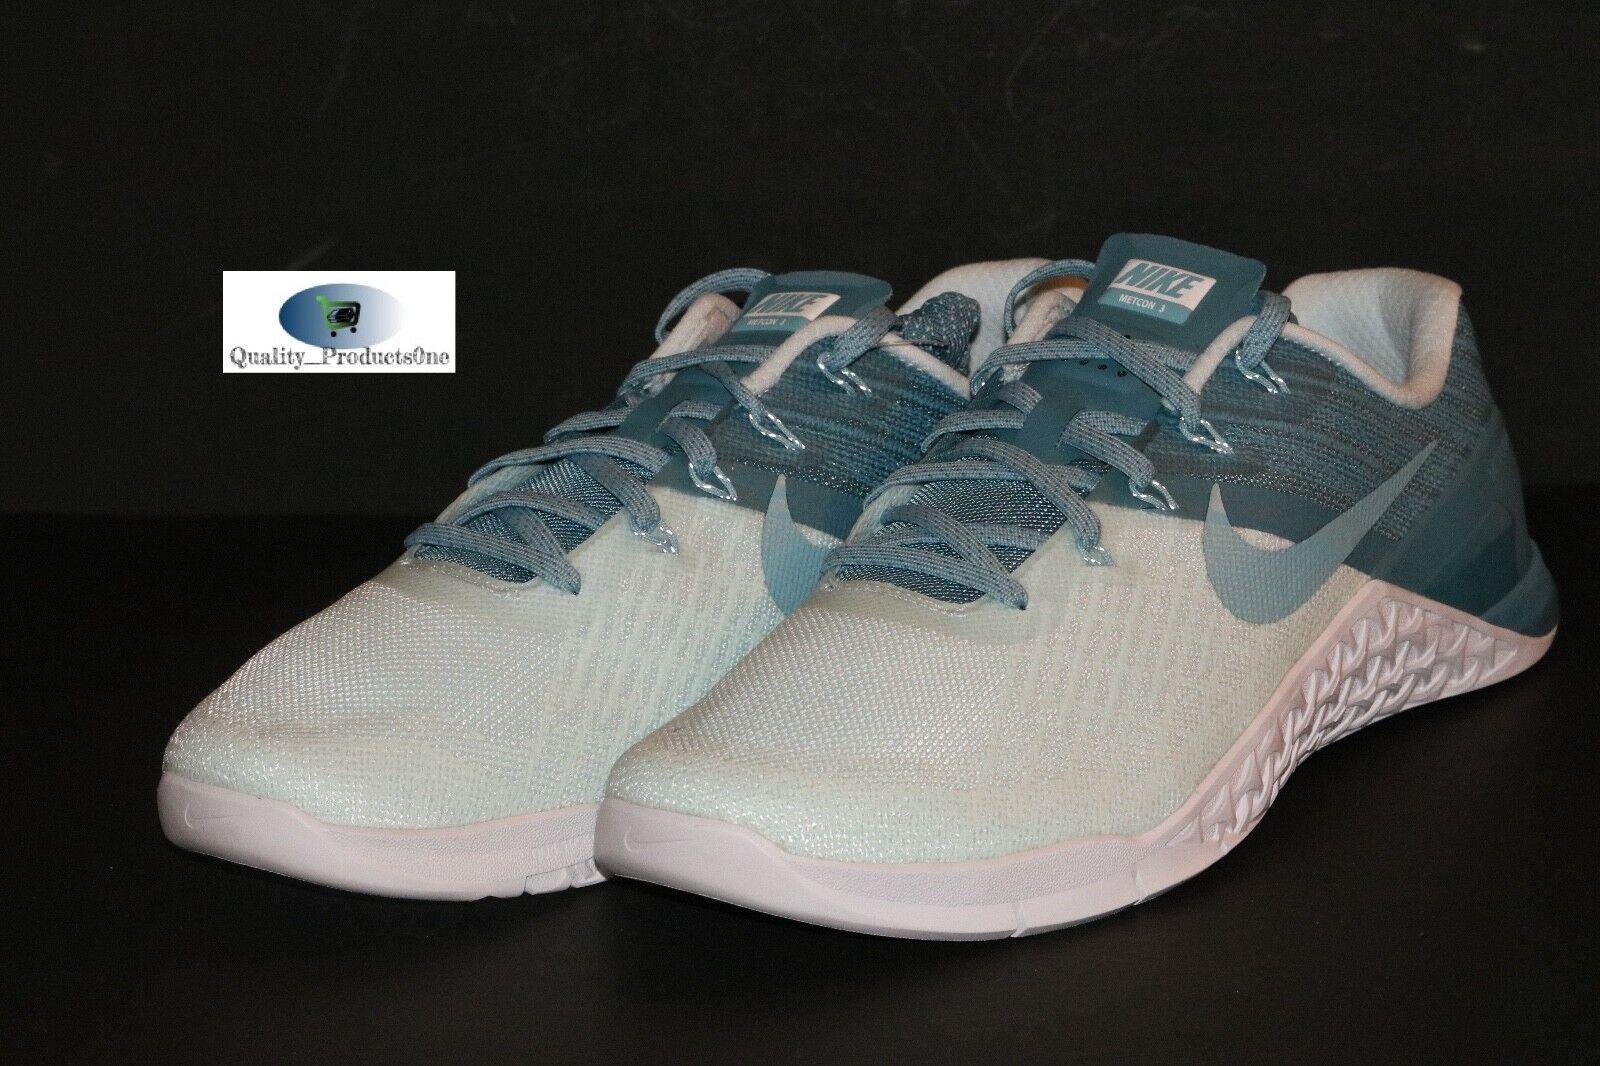 WOMEN'S Nike Metcon 3 Glacier Blue/Mica Blue 849807 400 Sz 11.5